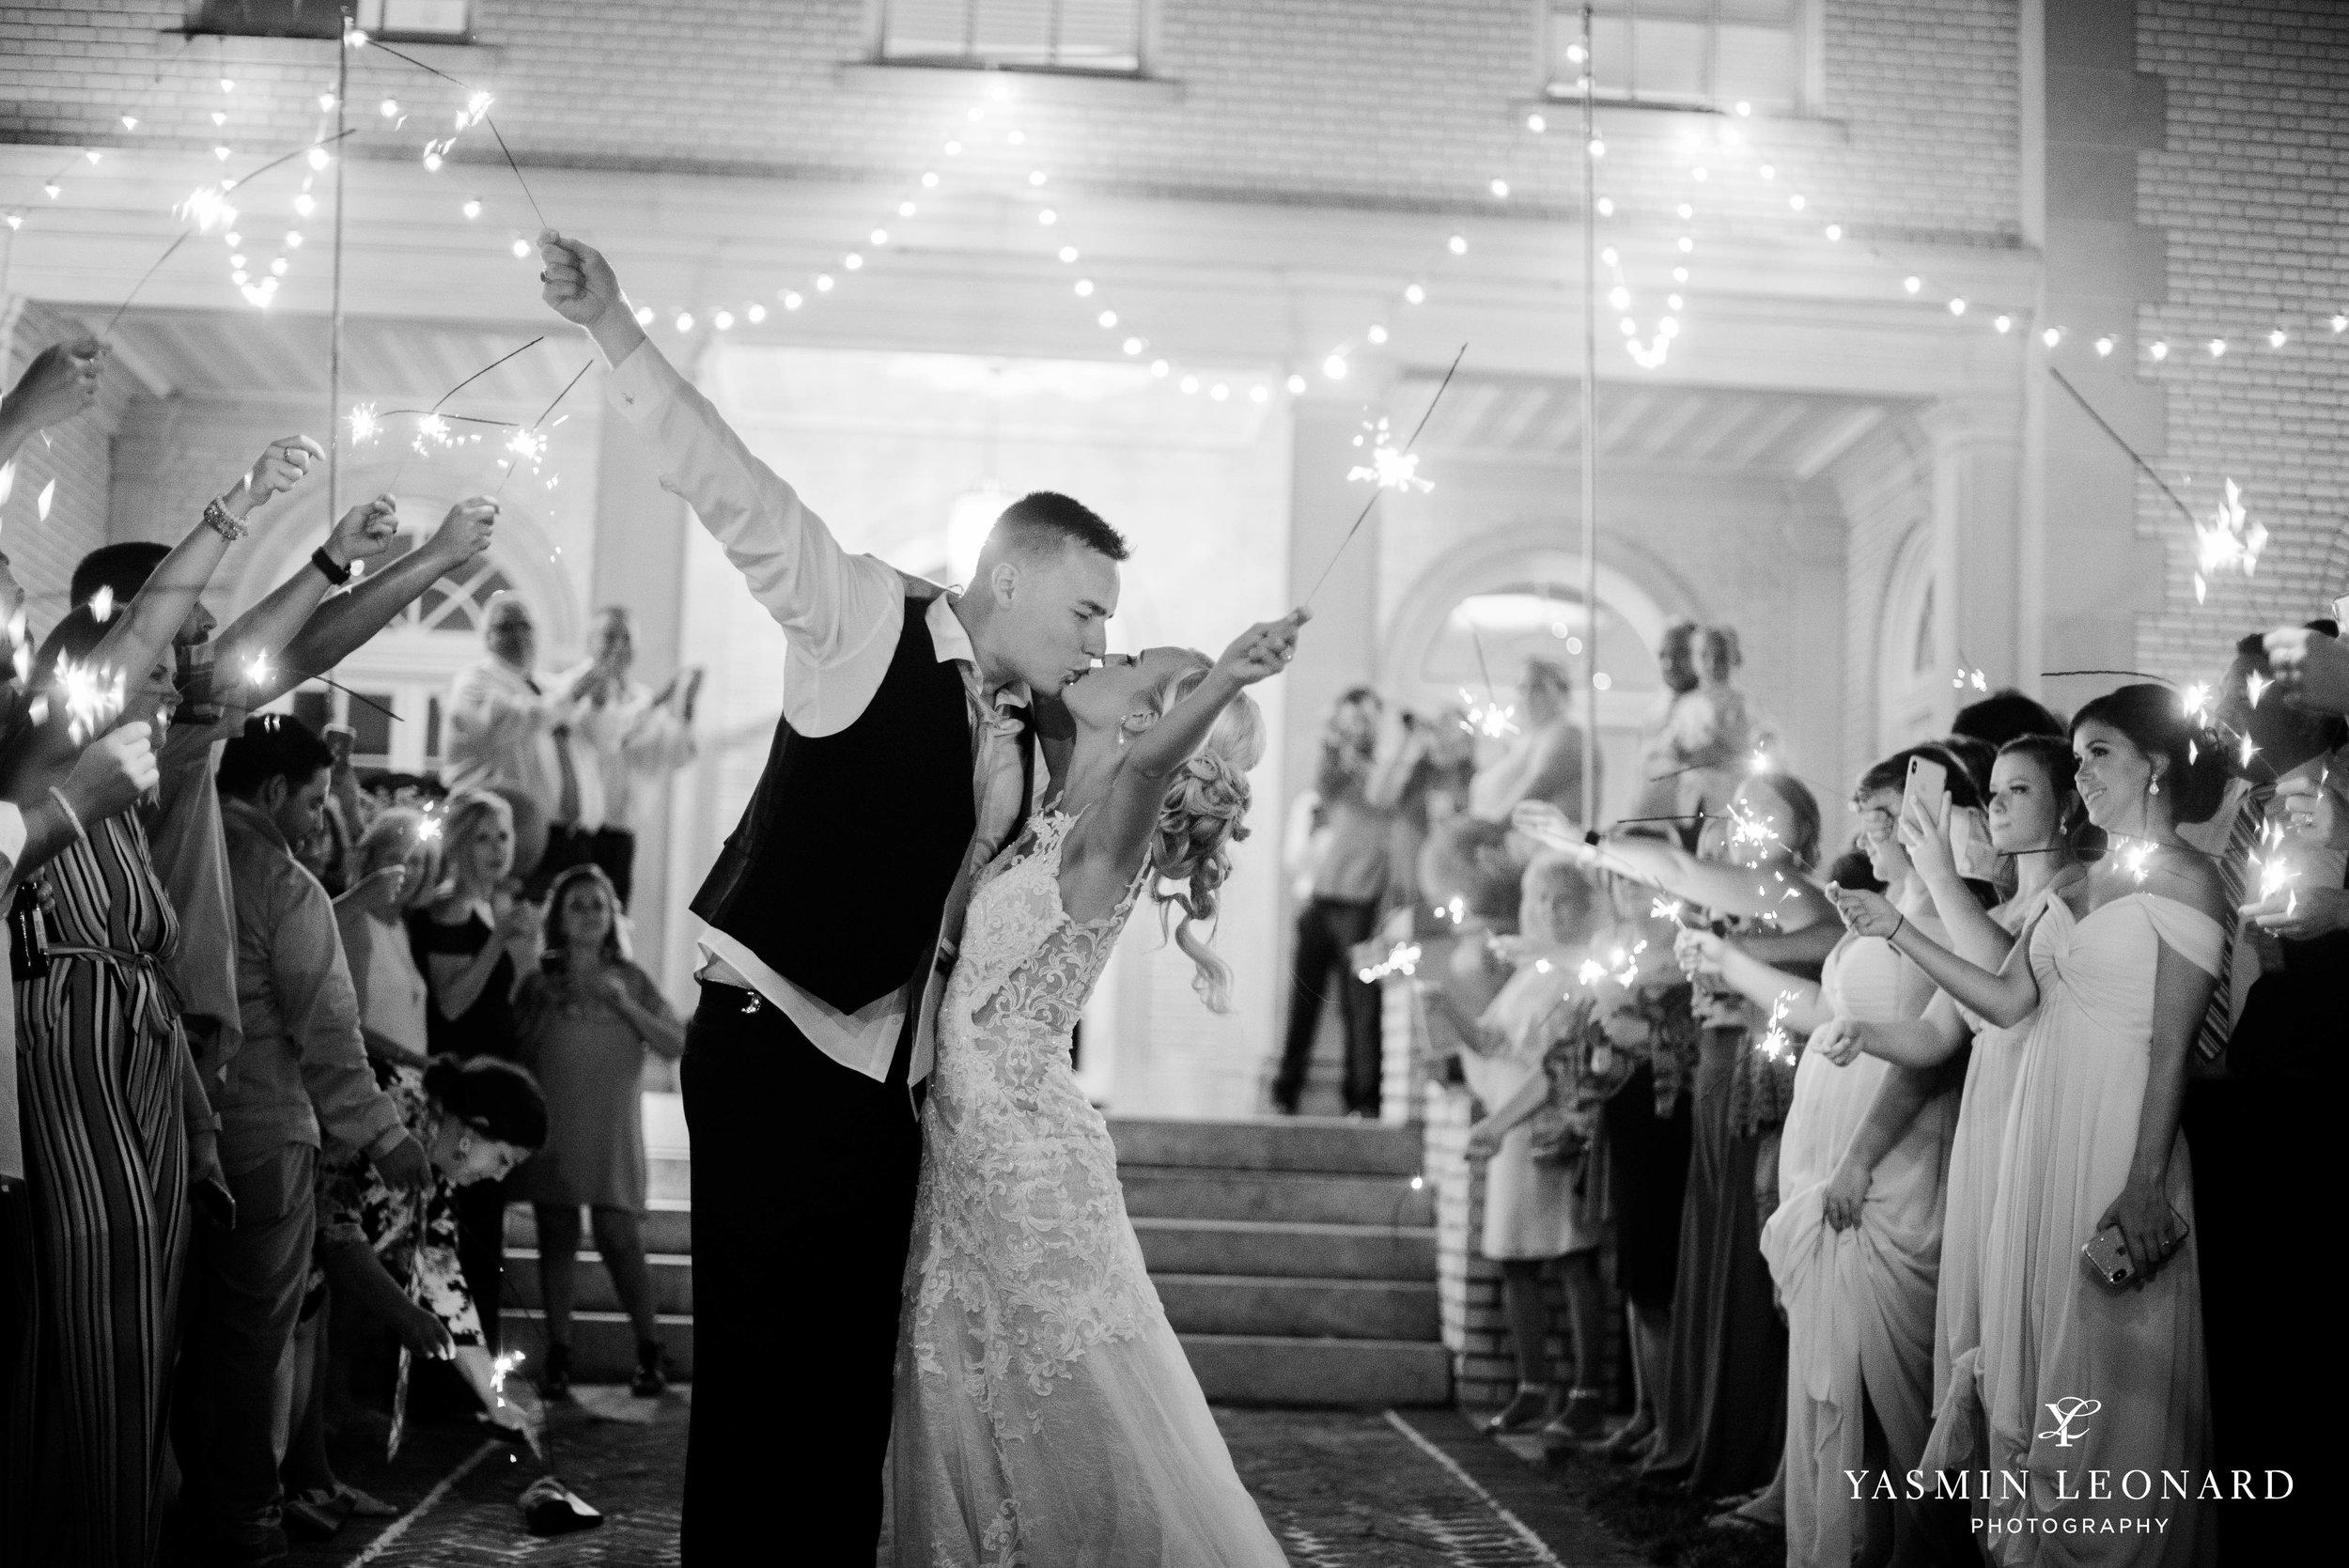 Separk Mansion - NC Weddings - Gastonia Wedding - NC Wedding Venues - Pink and Blue Wedding Ideas - Pink Bridesmaid Dresses - Yasmin Leonard Photography-74.jpg